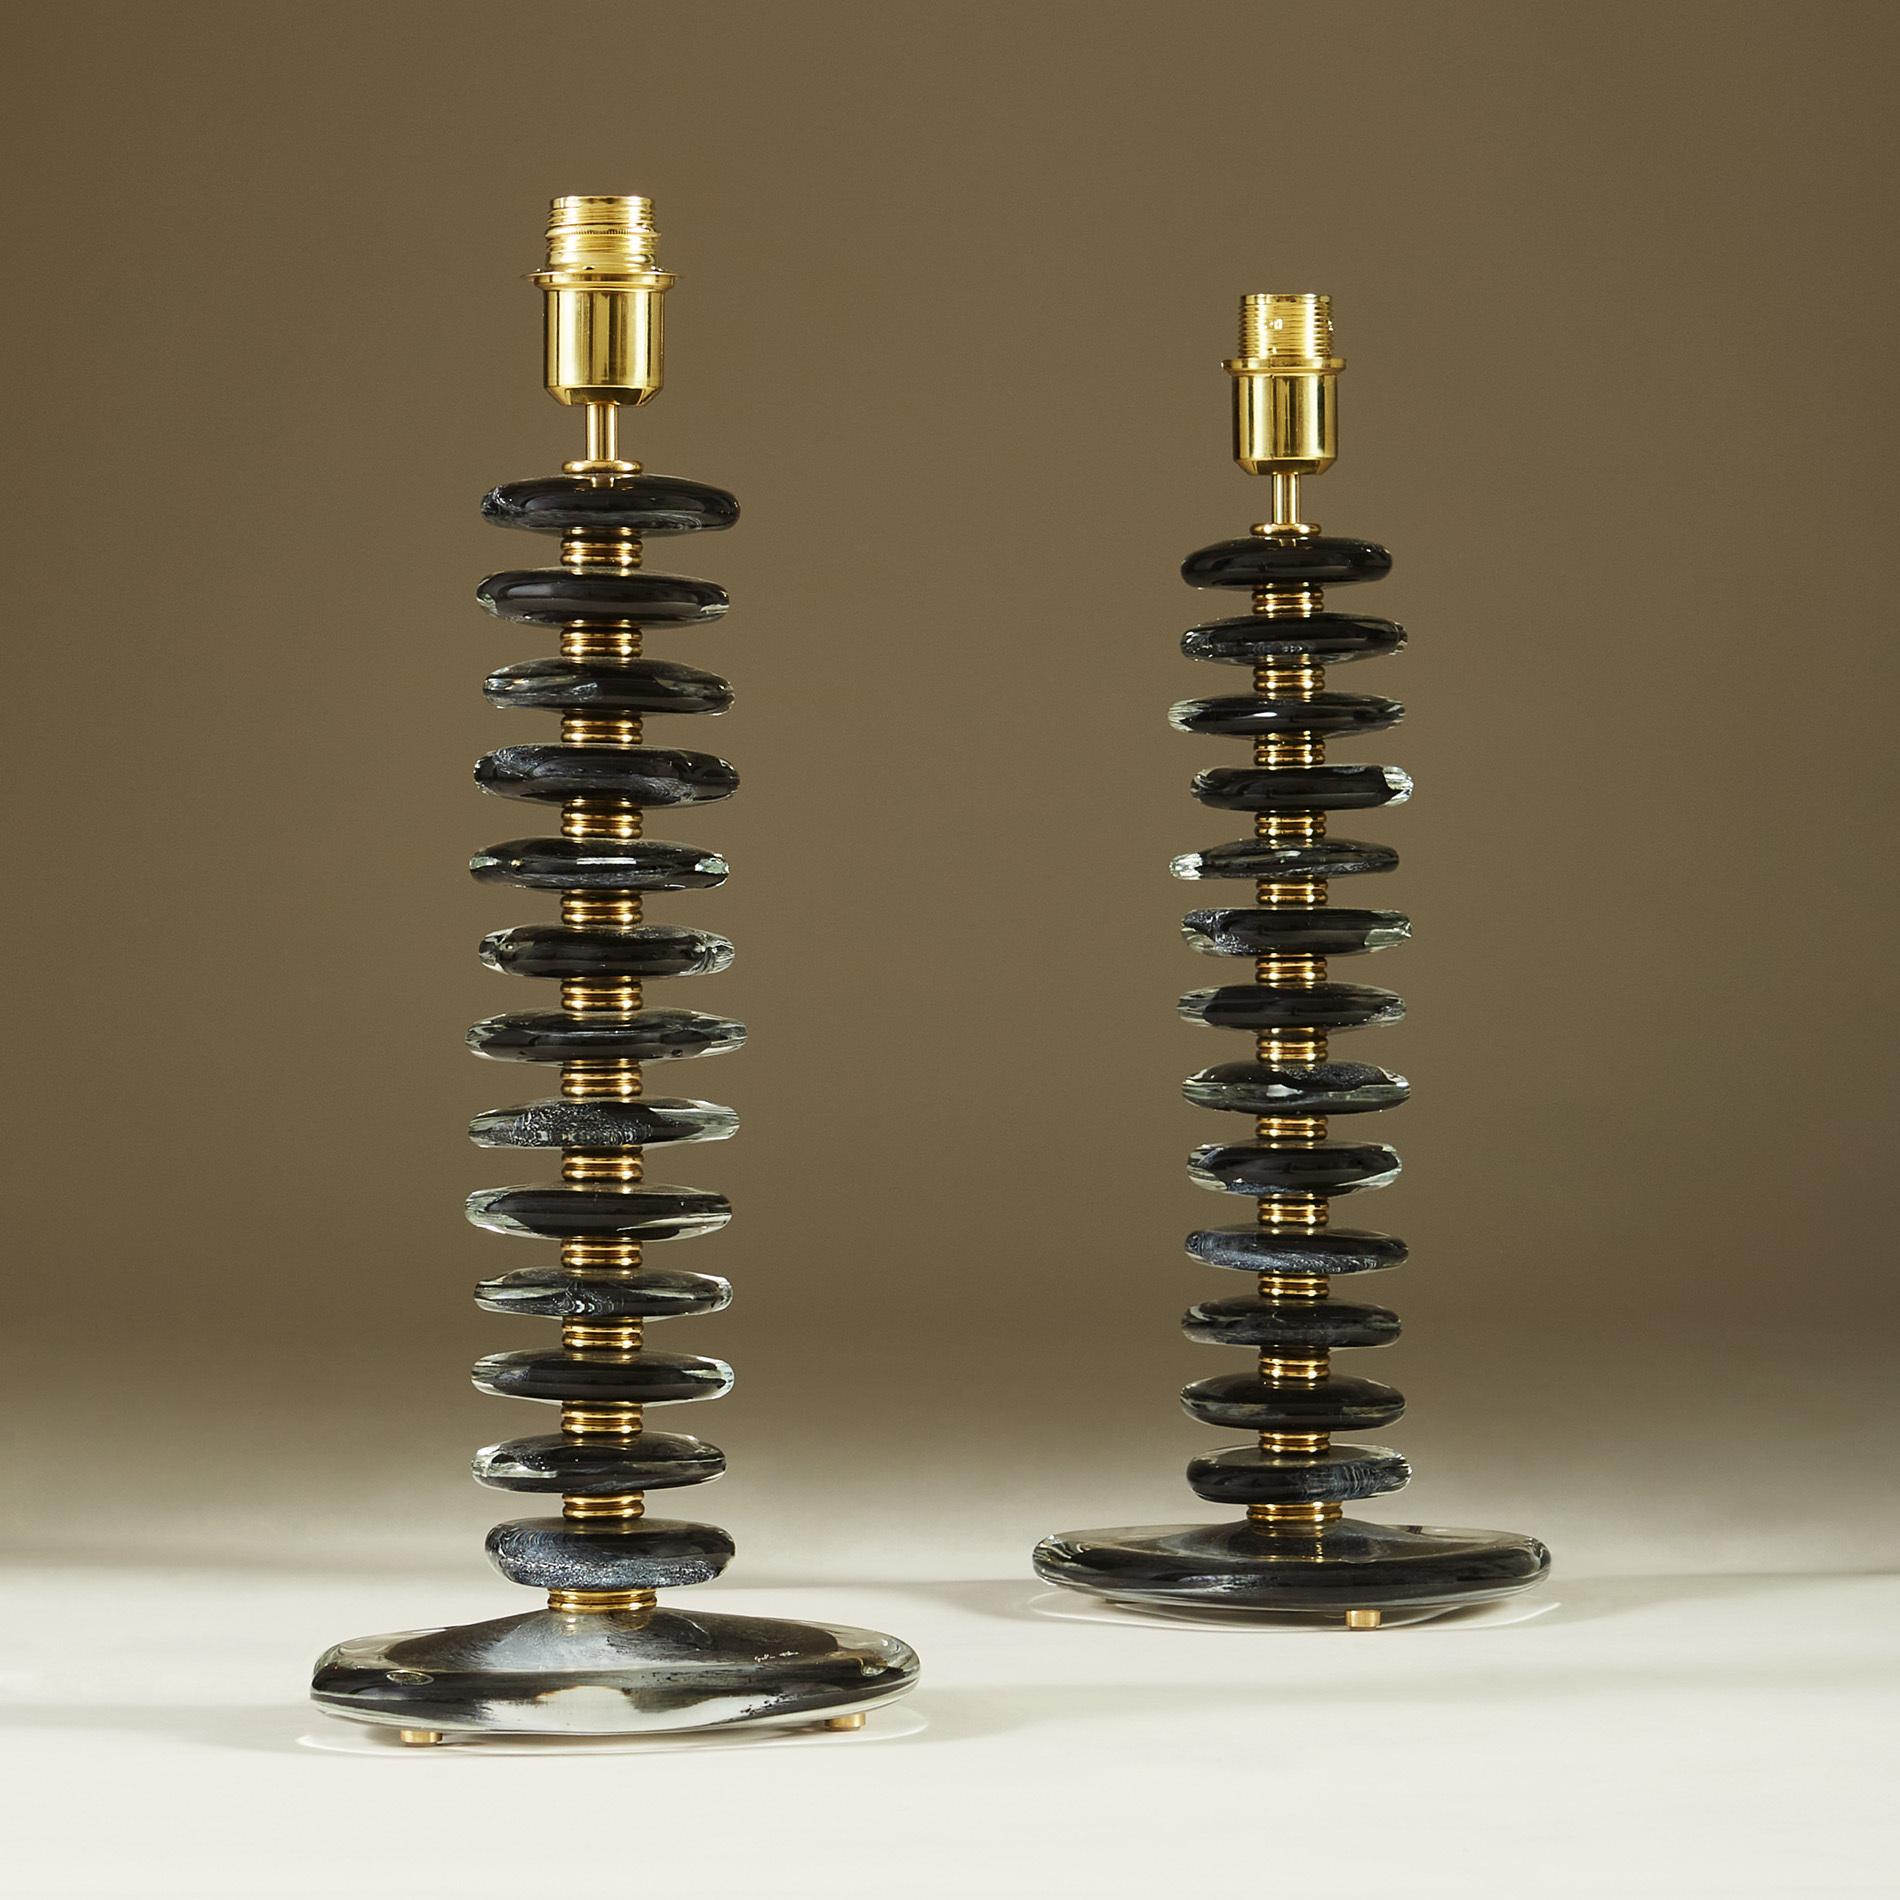 Black Murano Pebble Lamps 042 V1